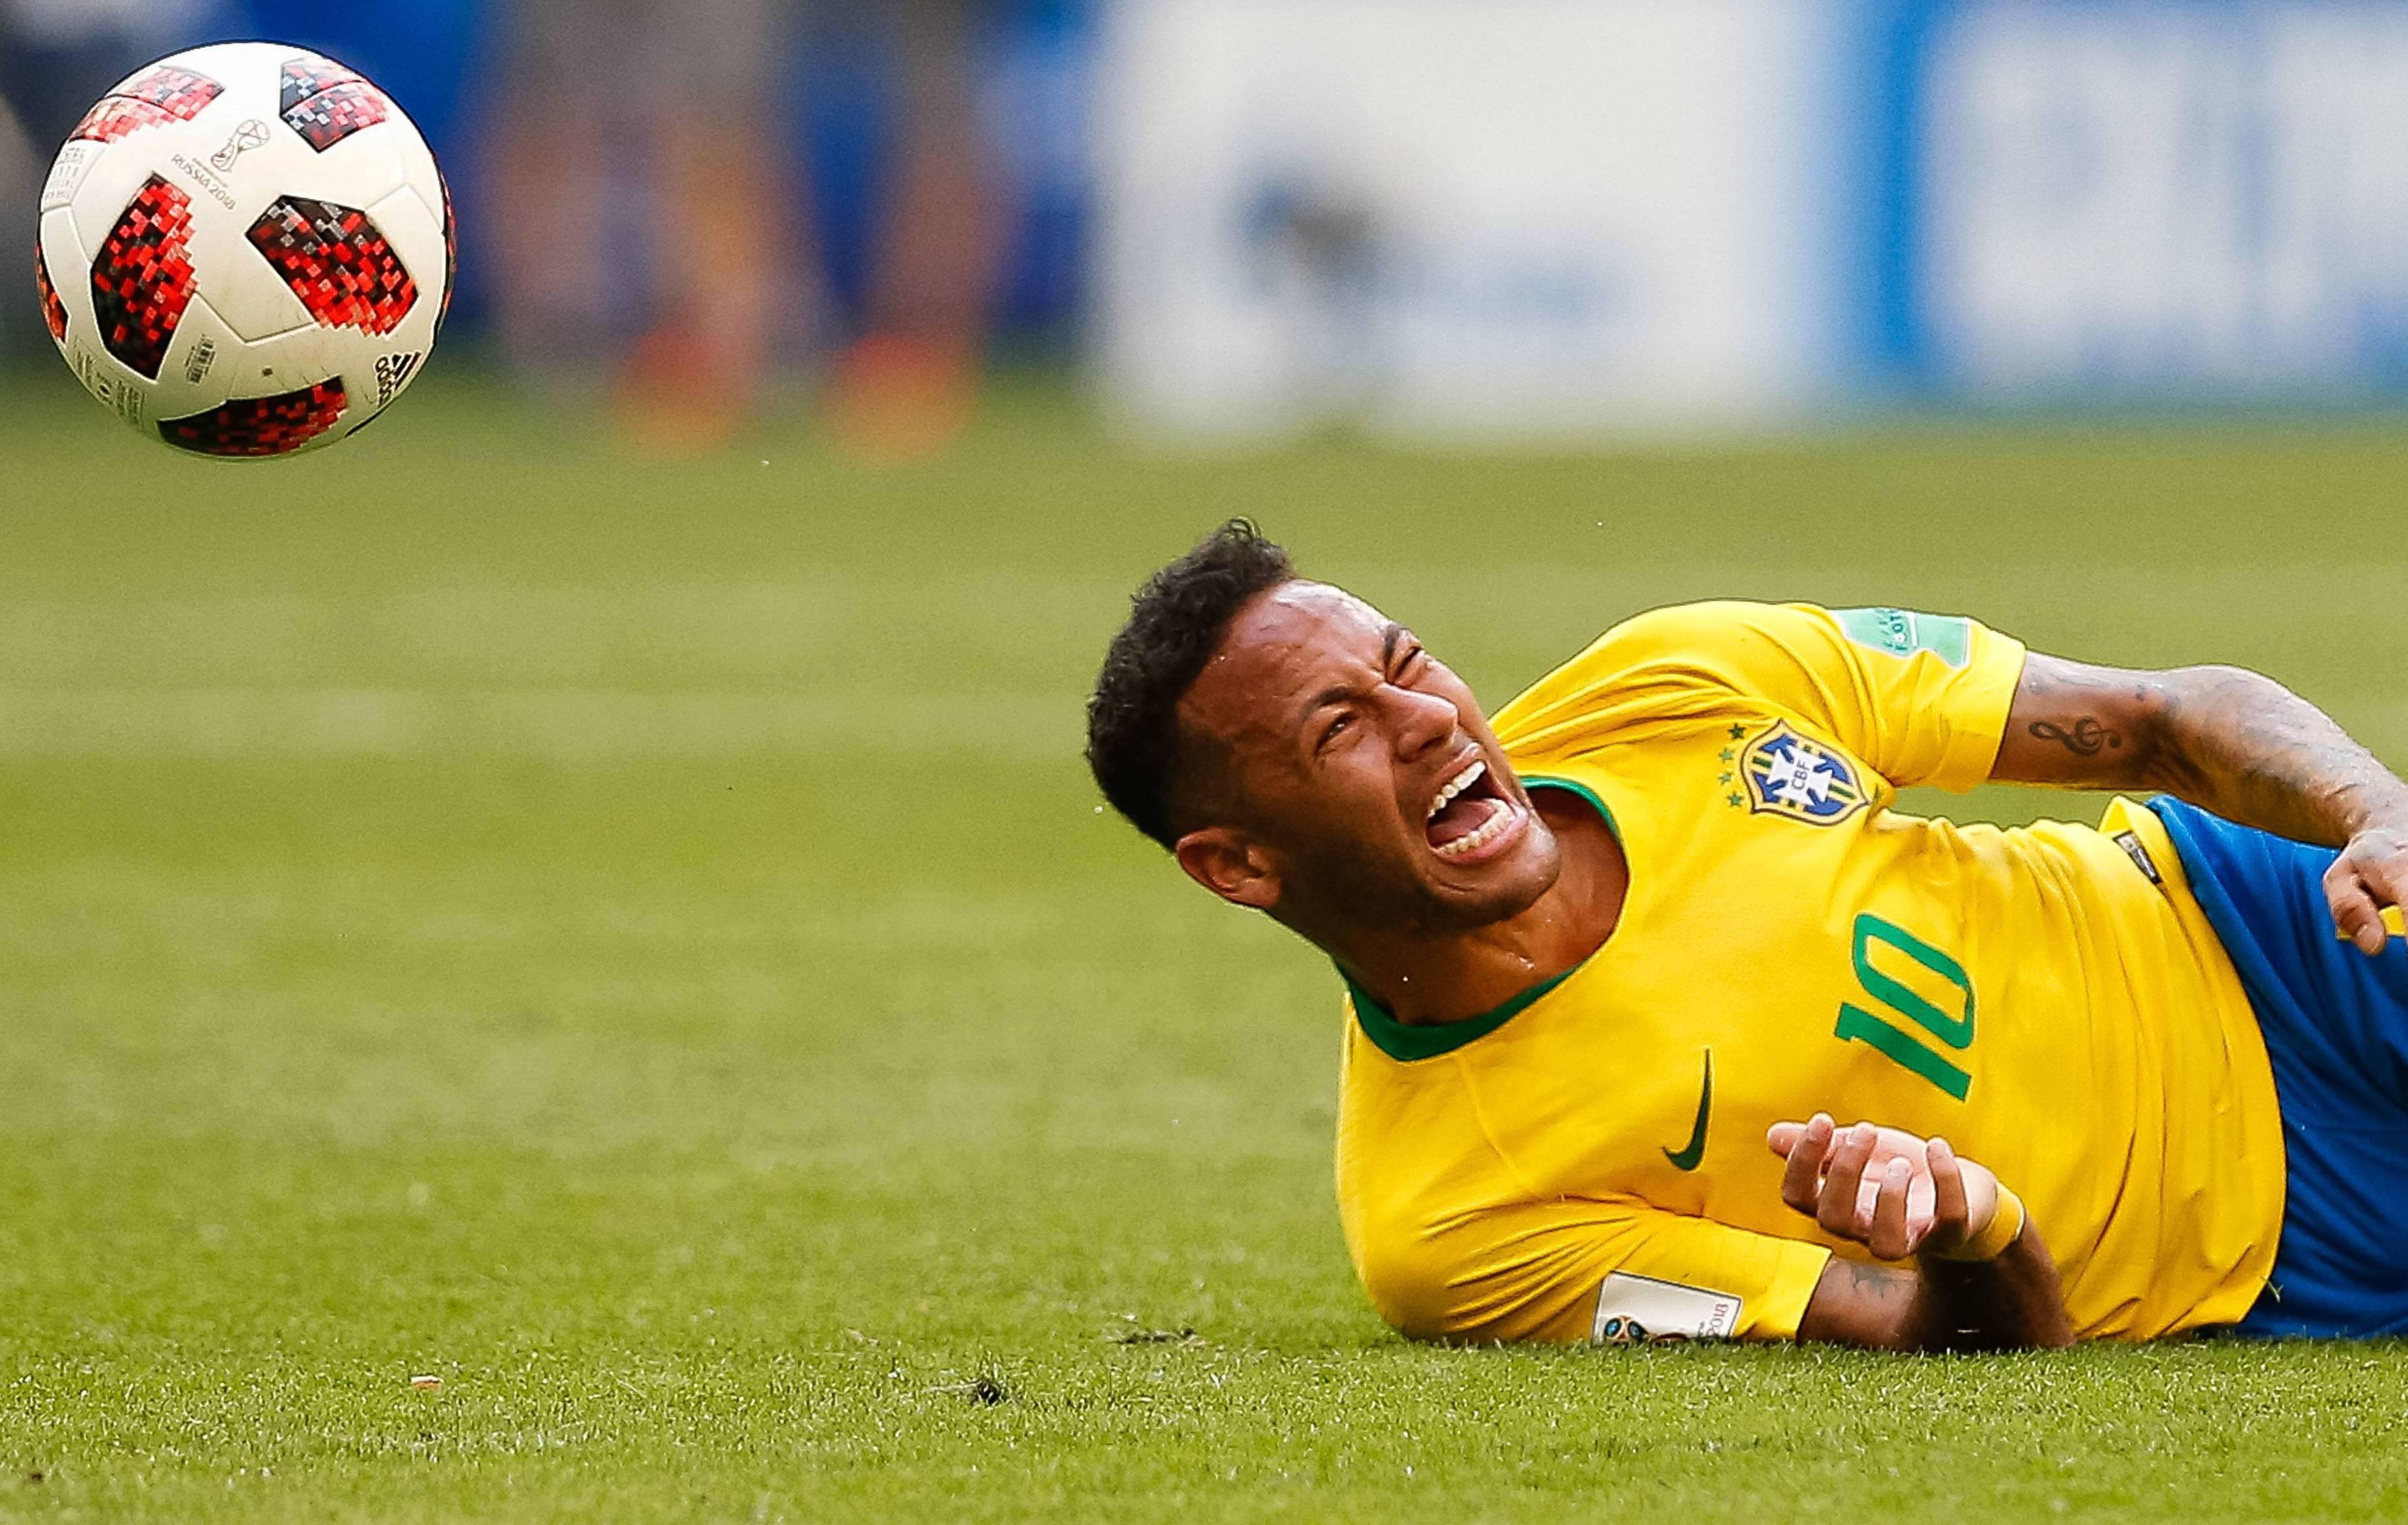 Coupe du monde 2018 neymar artiste patent mais star raill e russie 2018 coupe du monde - Coupe du monde 2018 football ...